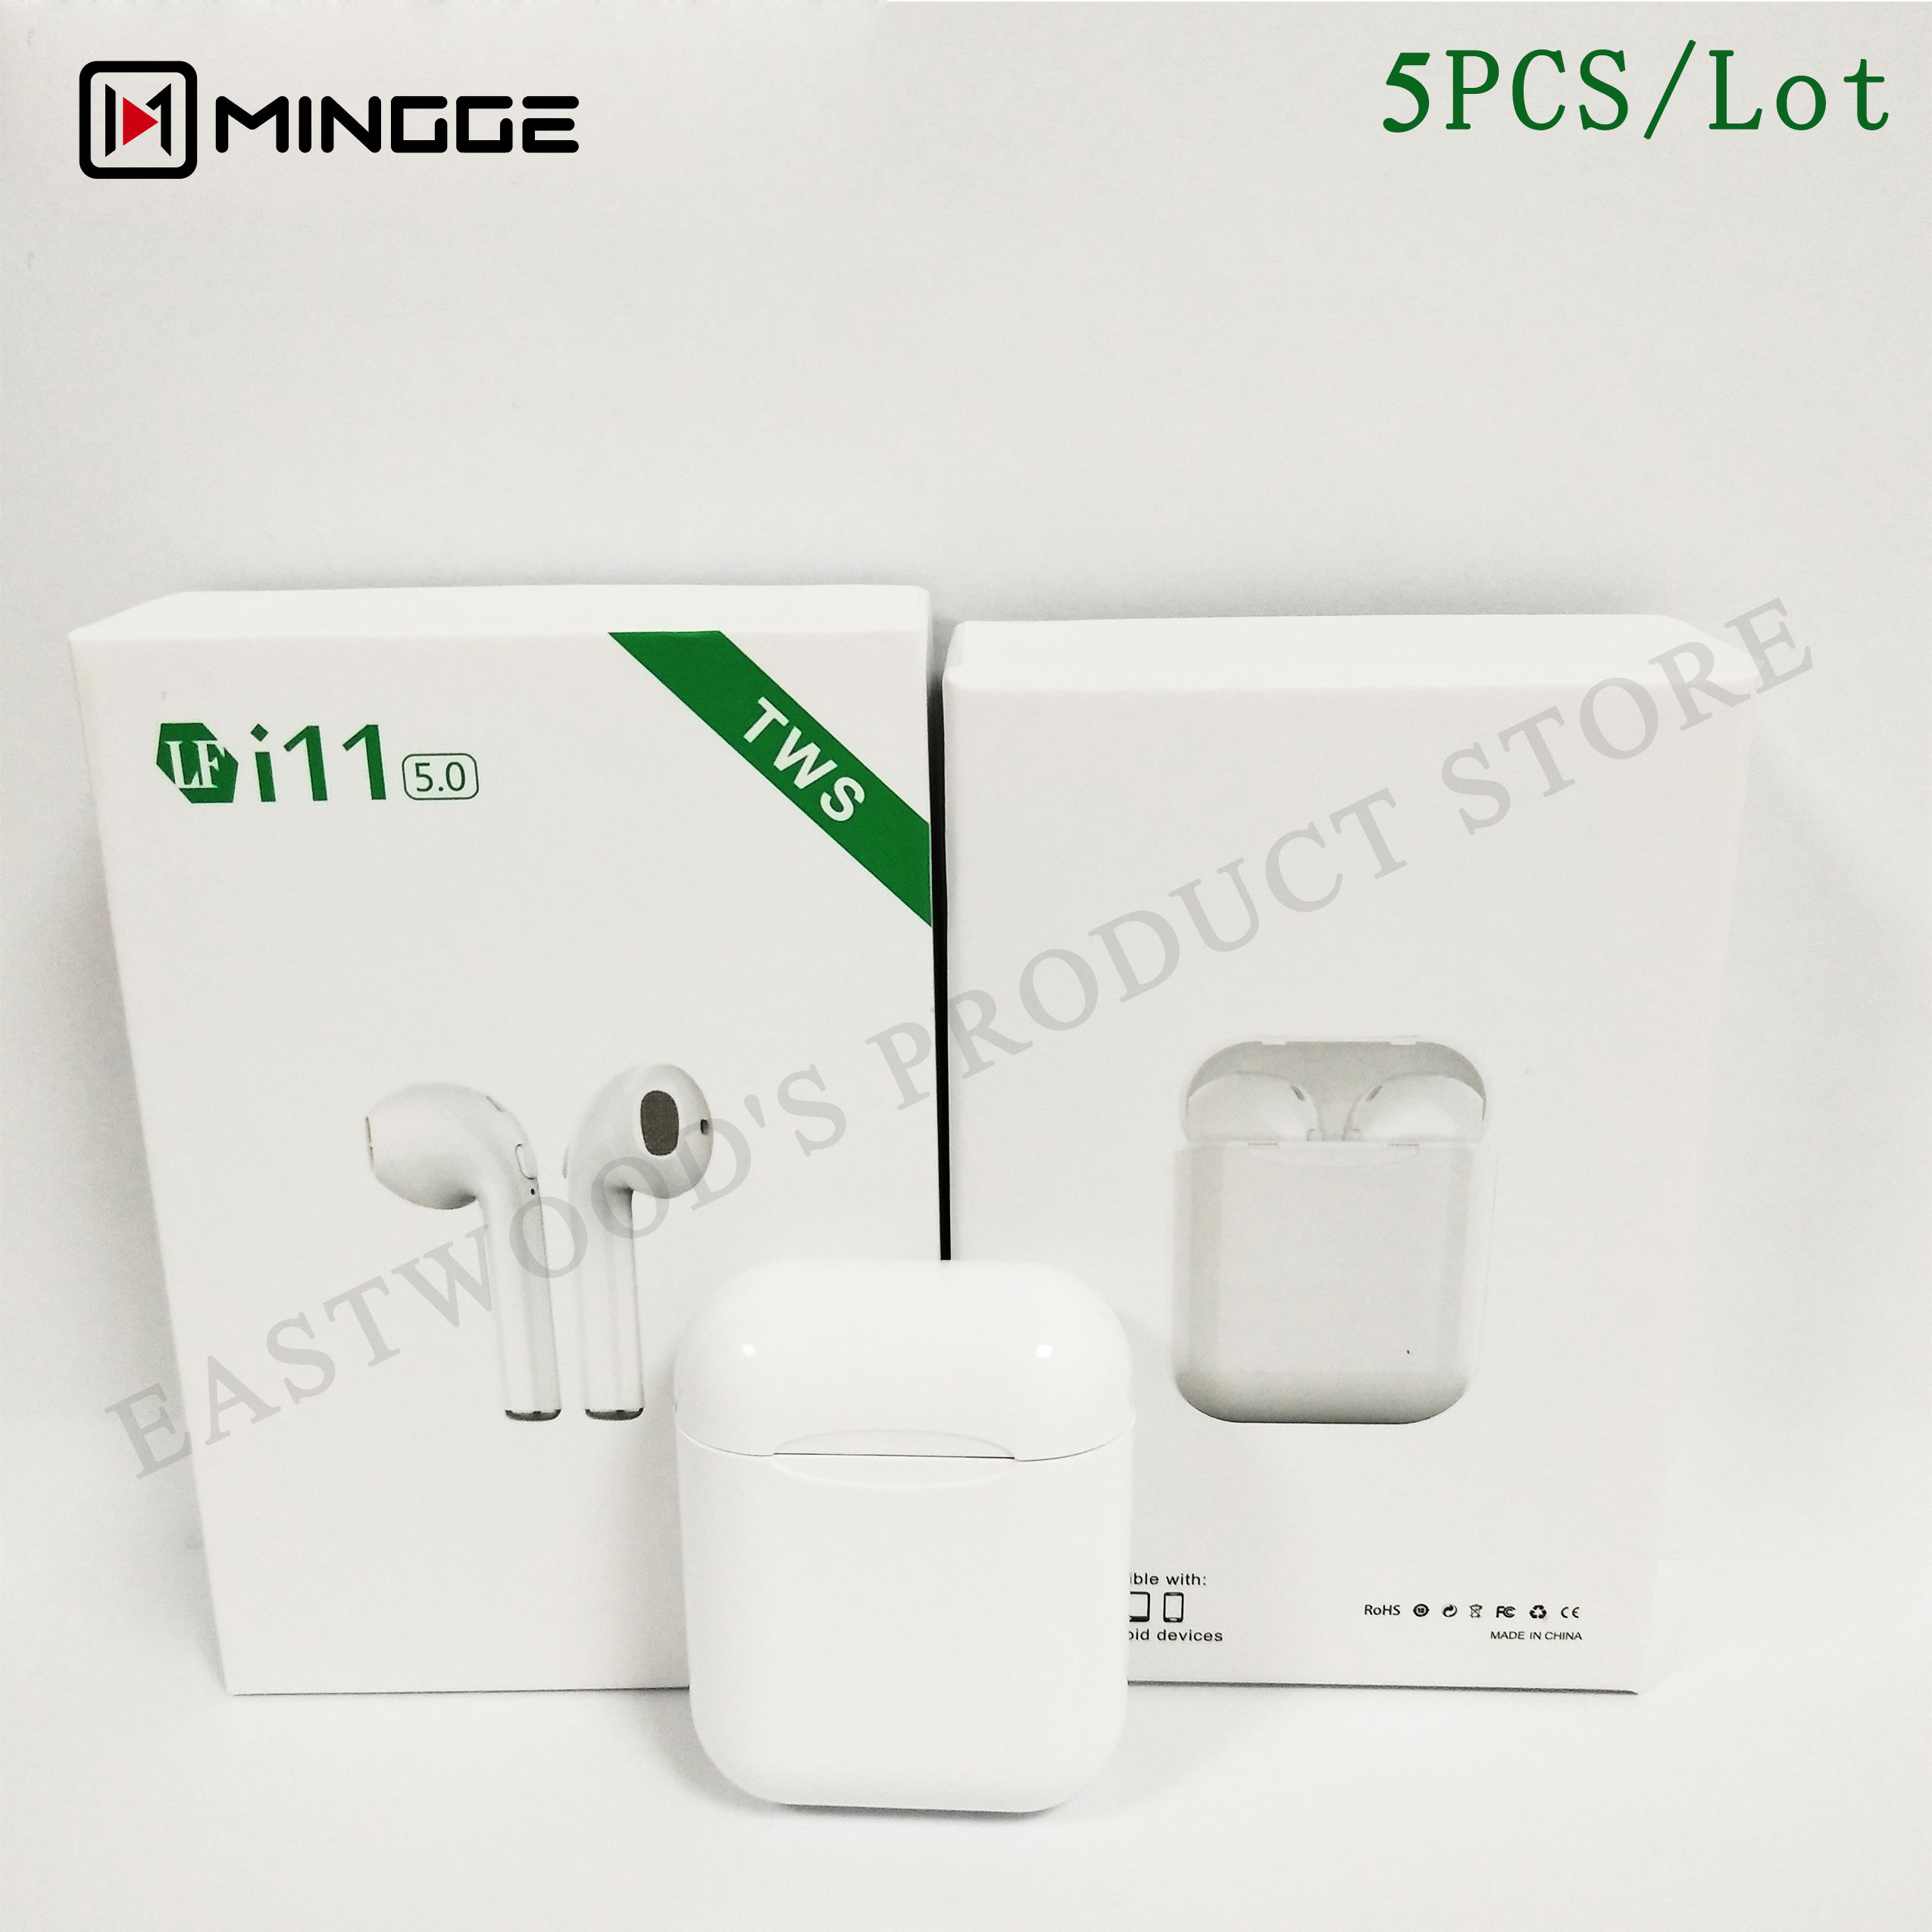 i11 TWS 5PCS/Lot Wireless Earphone V5.0 Bluetooth Headphone I7S TWS ear Mini Earbuds Headset for iPhone Samsung Xiaomi Huawei LG-in Bluetooth Earphones & Headphones from Consumer Electronics    1